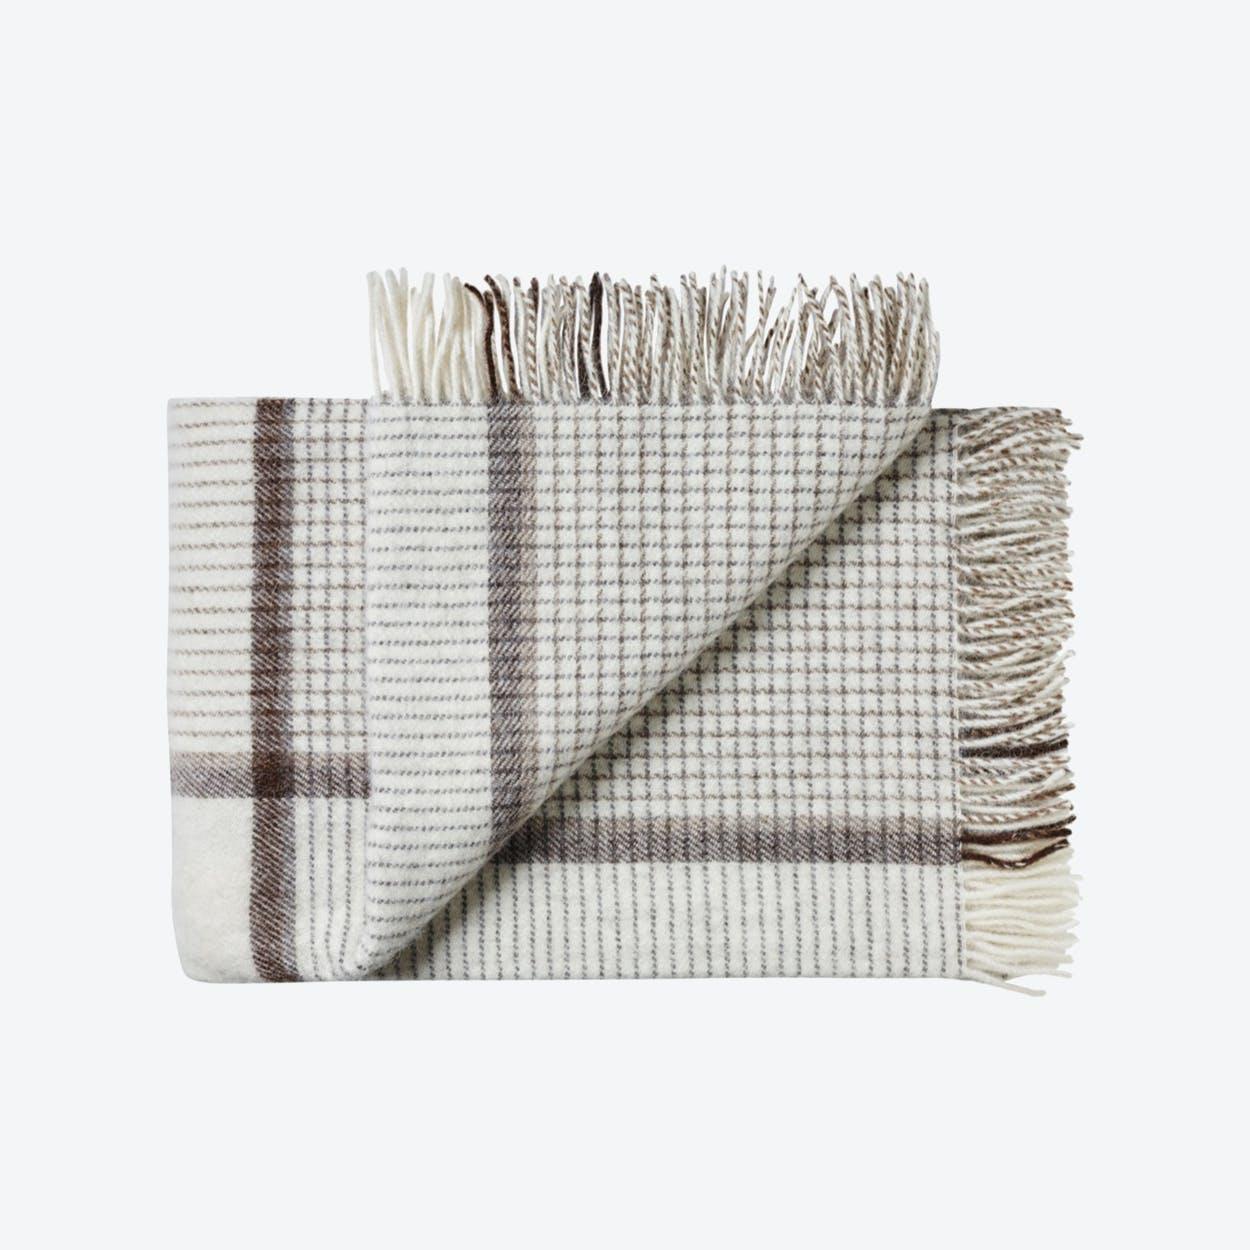 Oxford Alpaca/Wool Throw in White-Camel Blocks